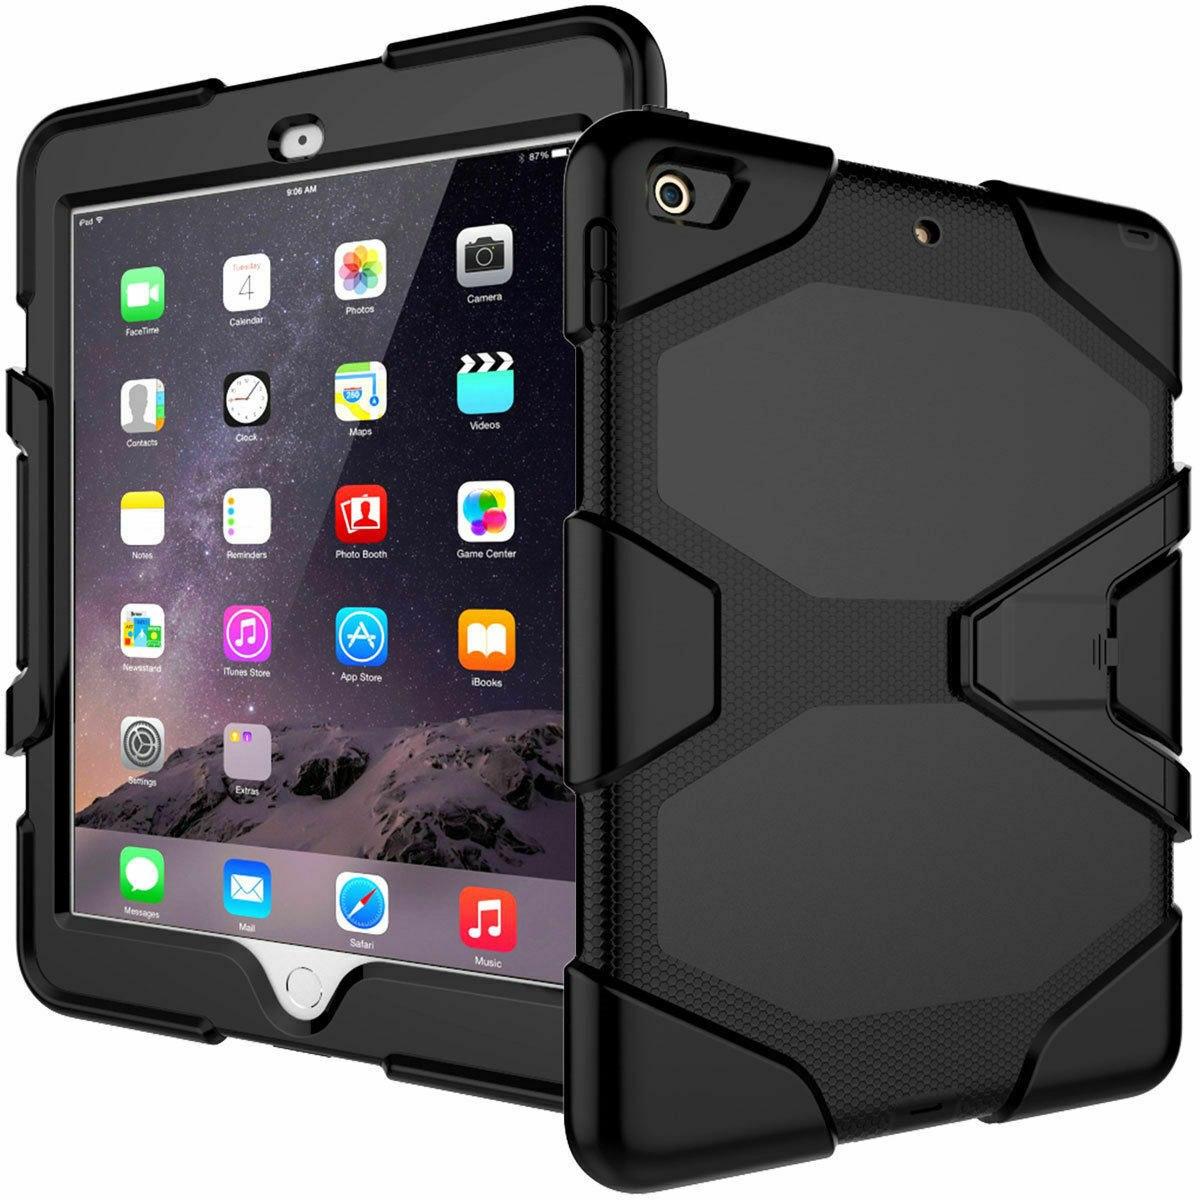 Rugged Case for iPad 6th Gen 9.7 black